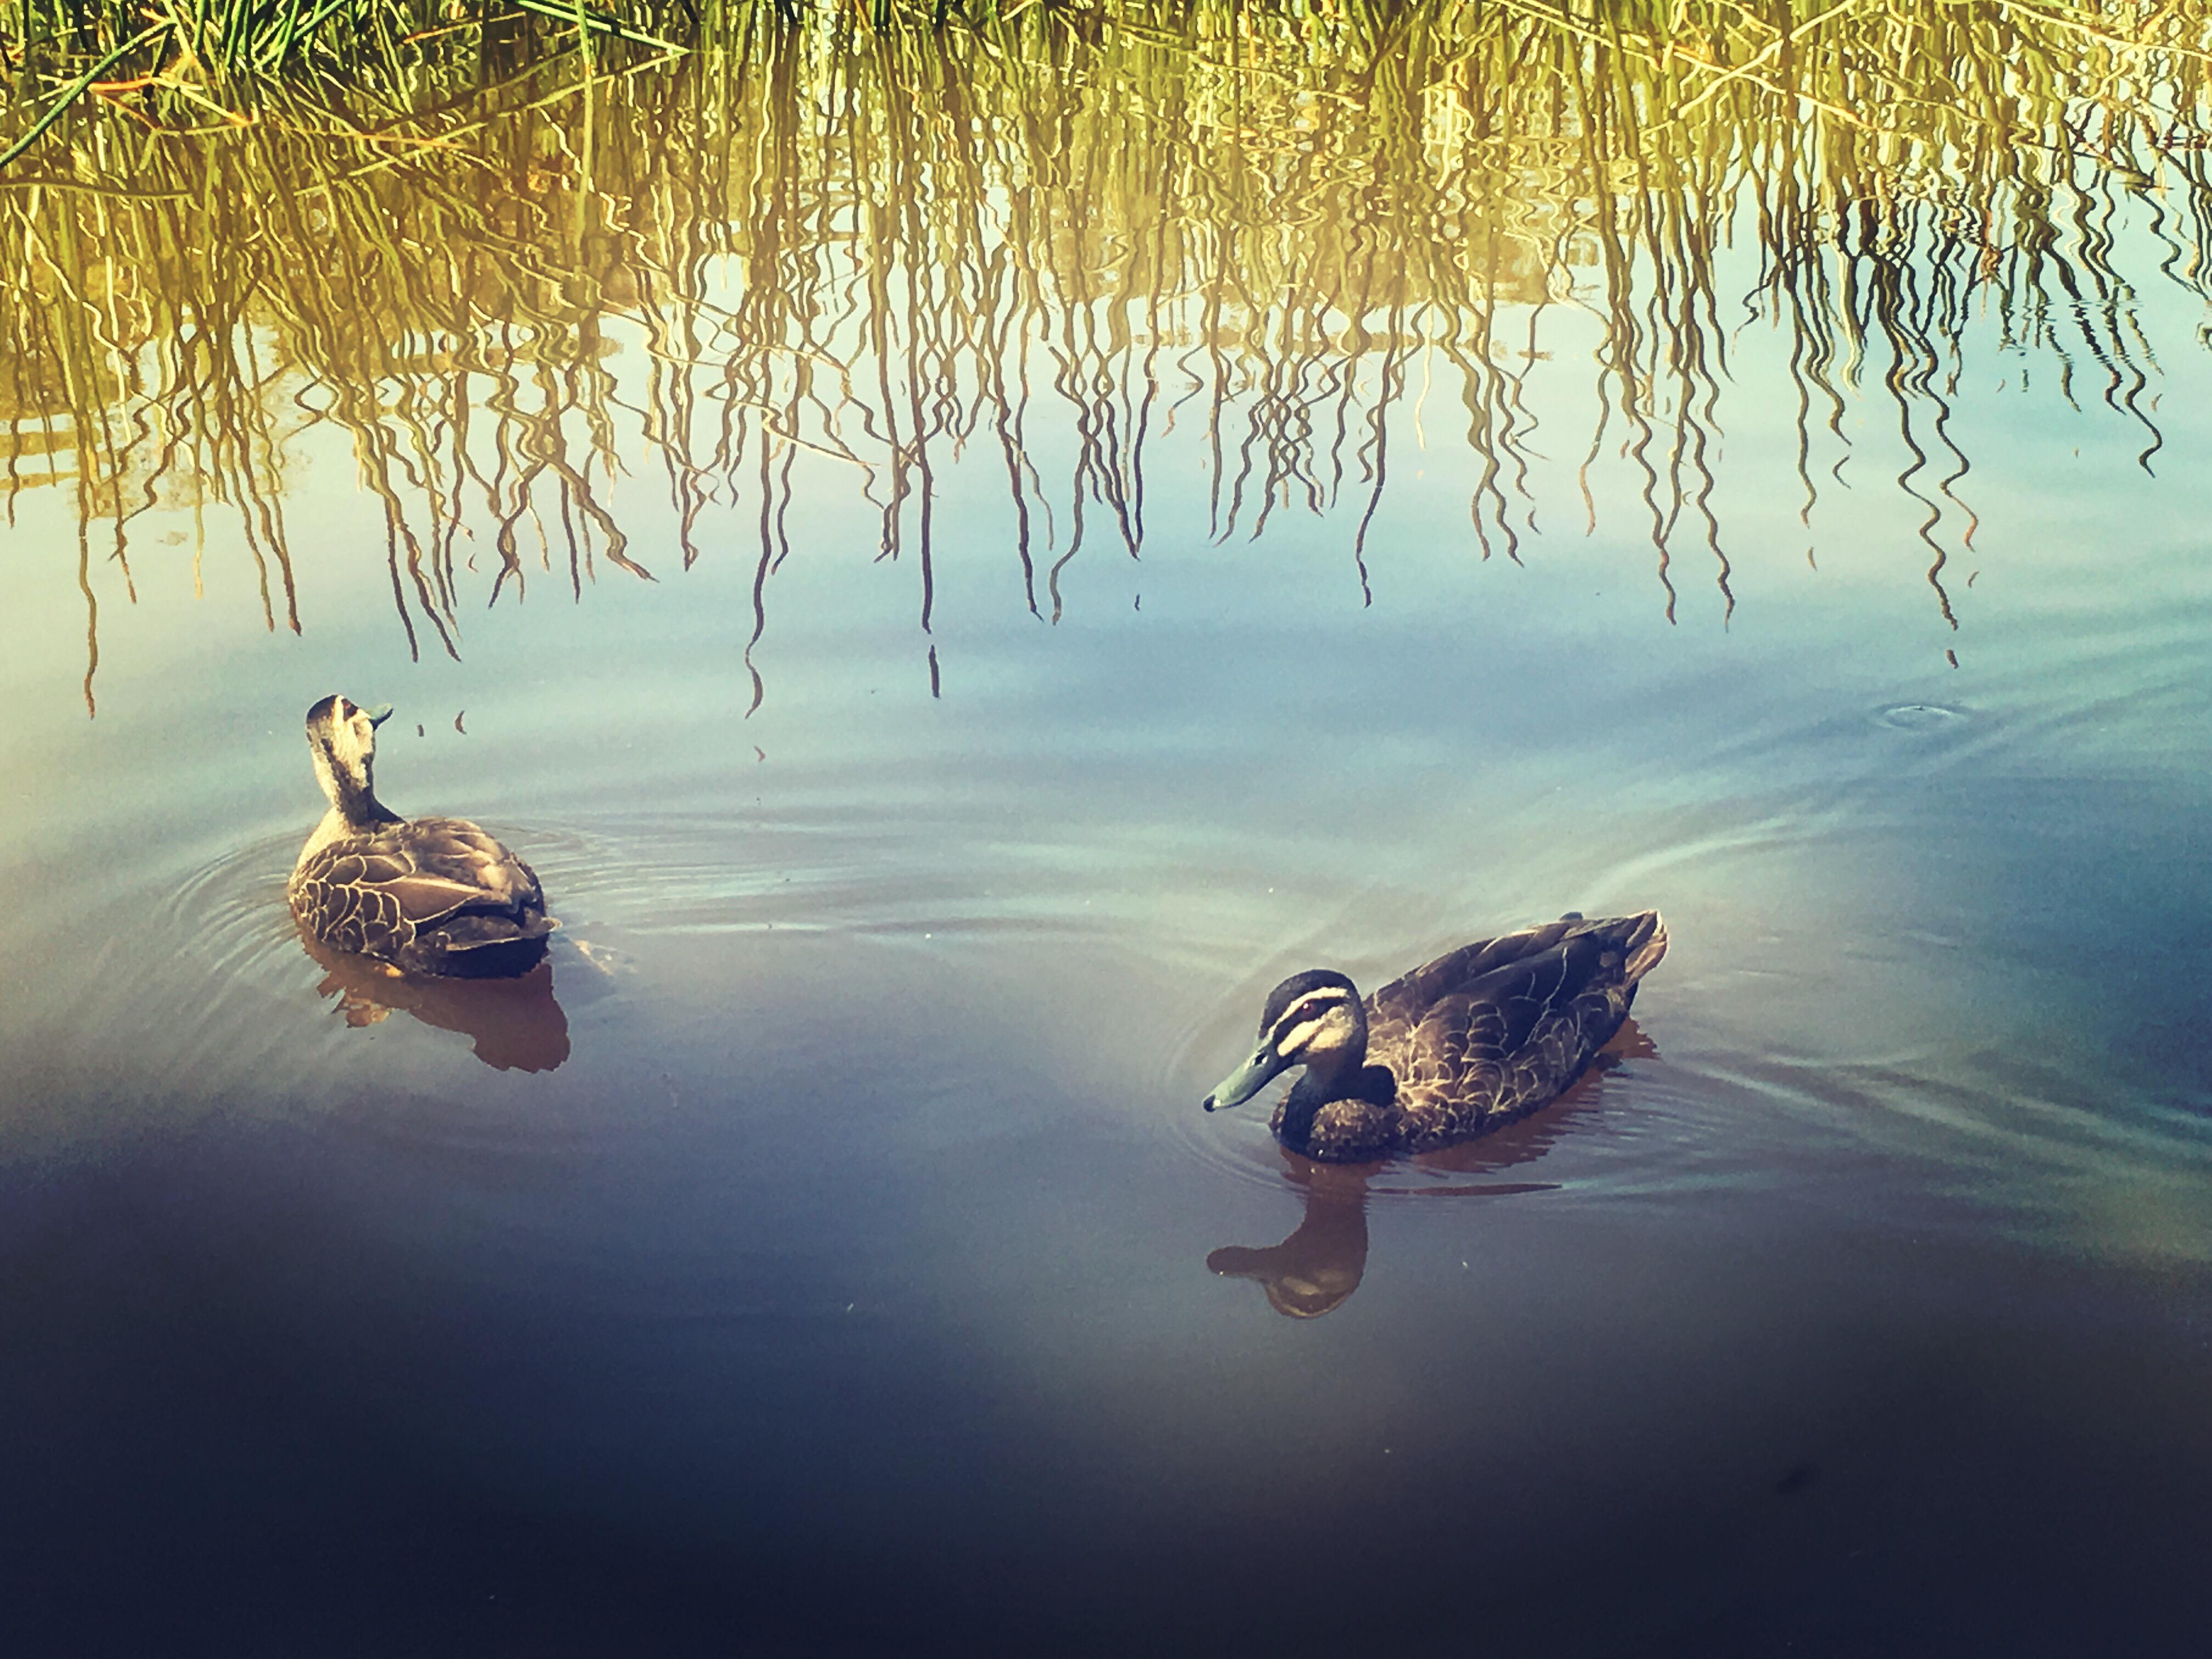 Ducks photography